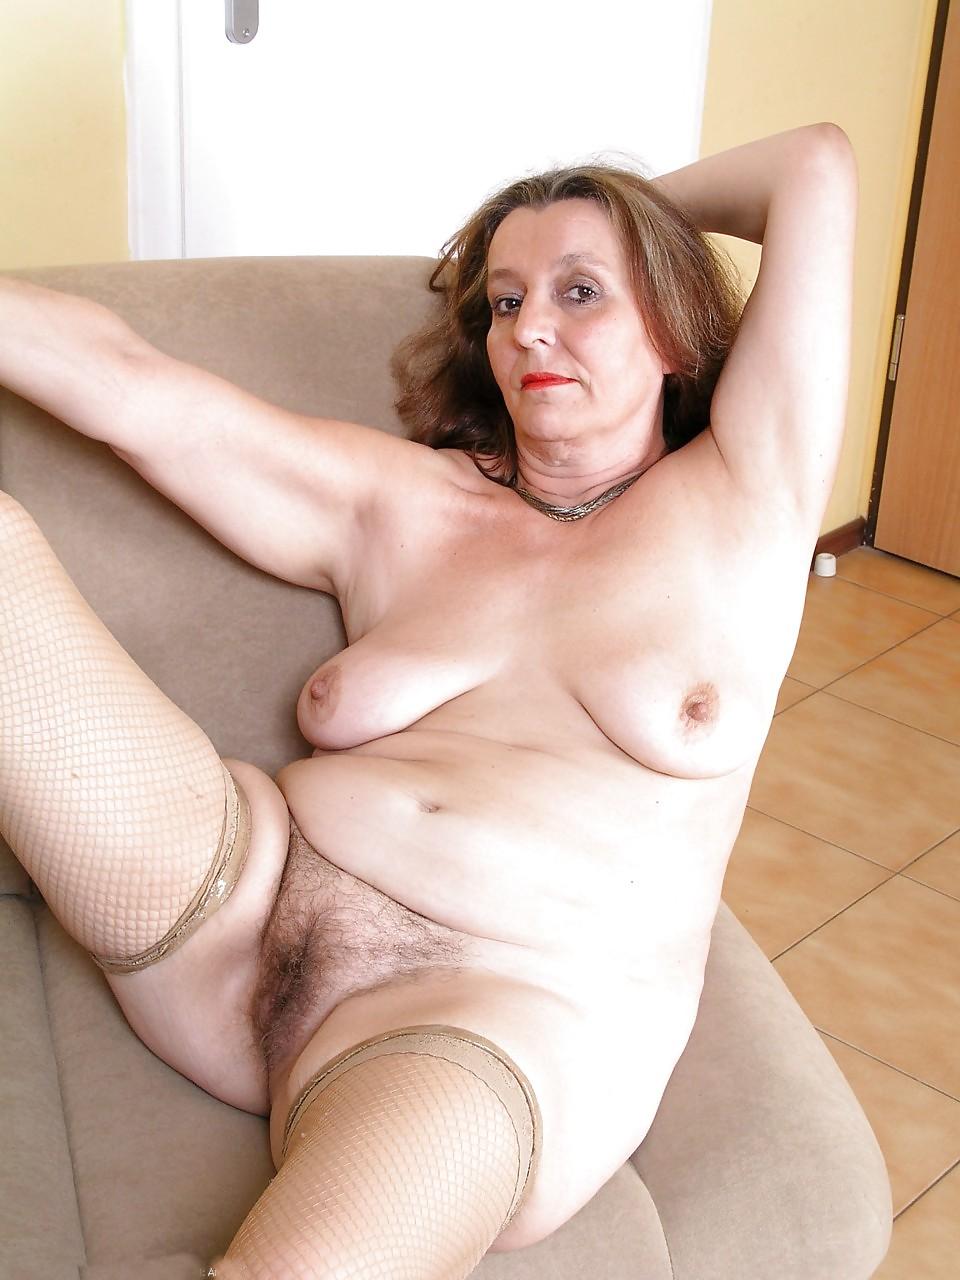 Free very mature women pics — pic 12